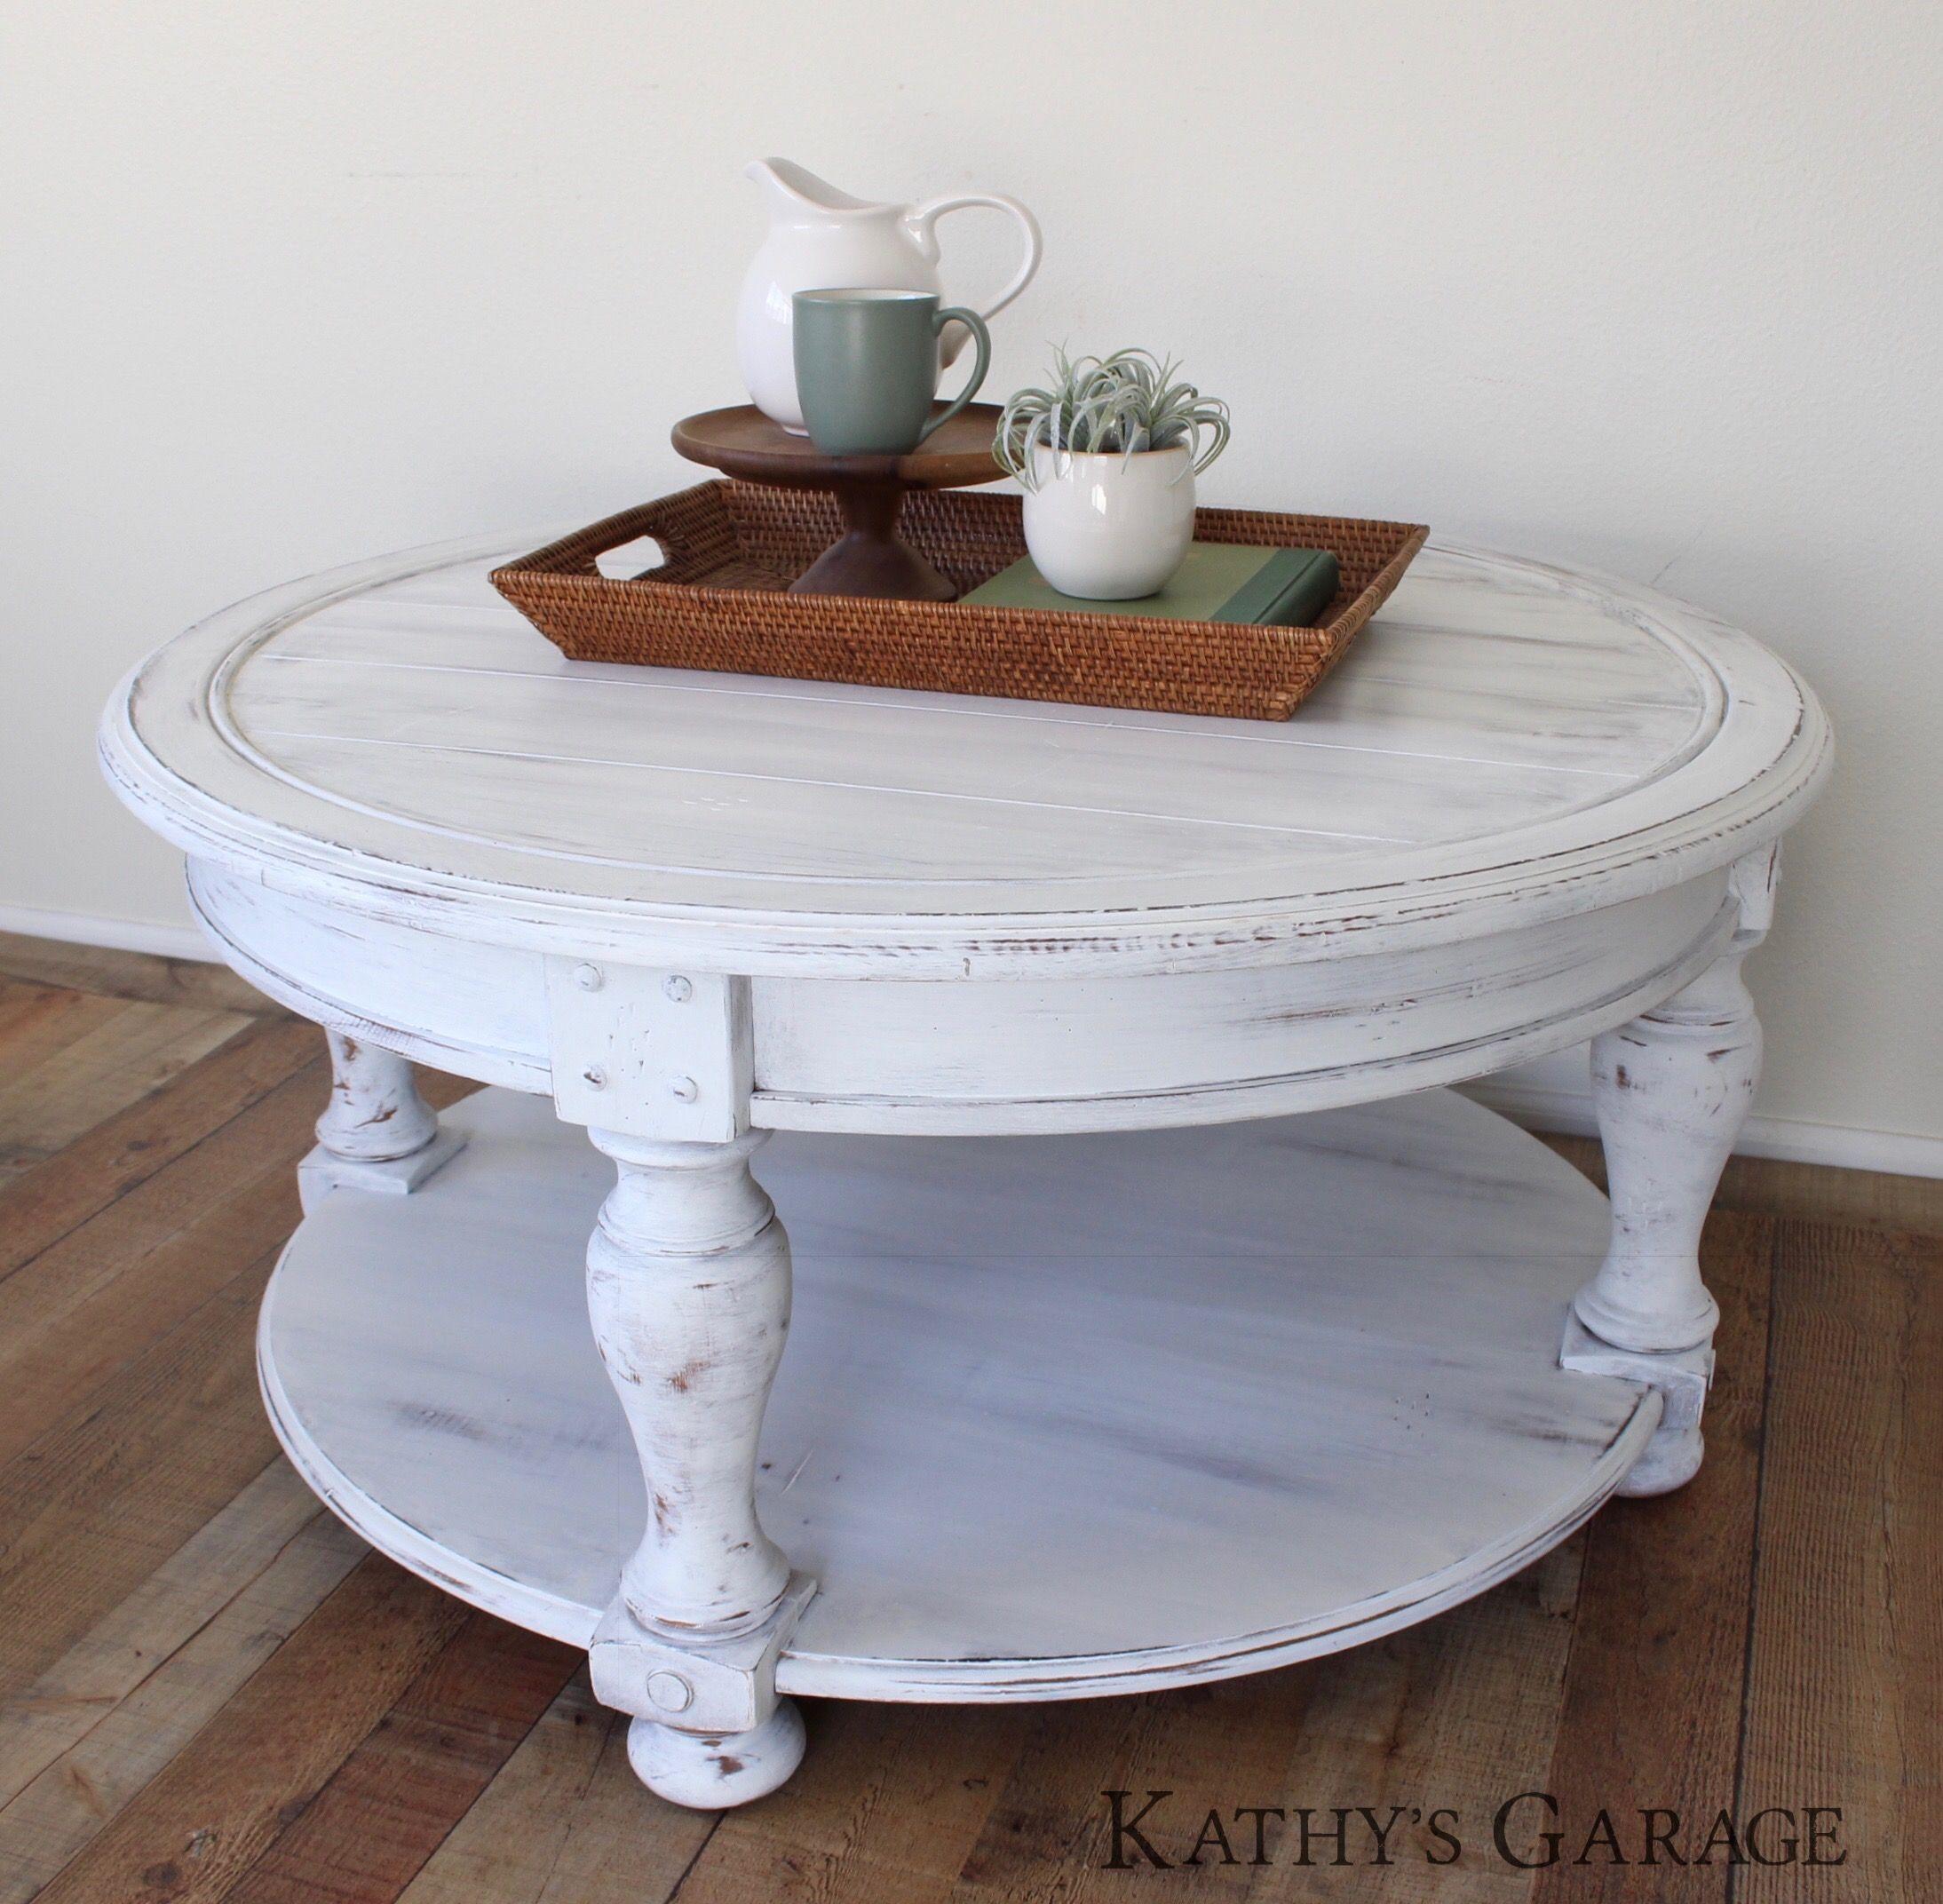 White Coffee Table Farmhouse Coffee Table Round Coffee Table Shiplap Distressed Table Coffee Table Farmhouse Chalk Paint Coffee Table Painted Coffee Tables [ 2144 x 2188 Pixel ]